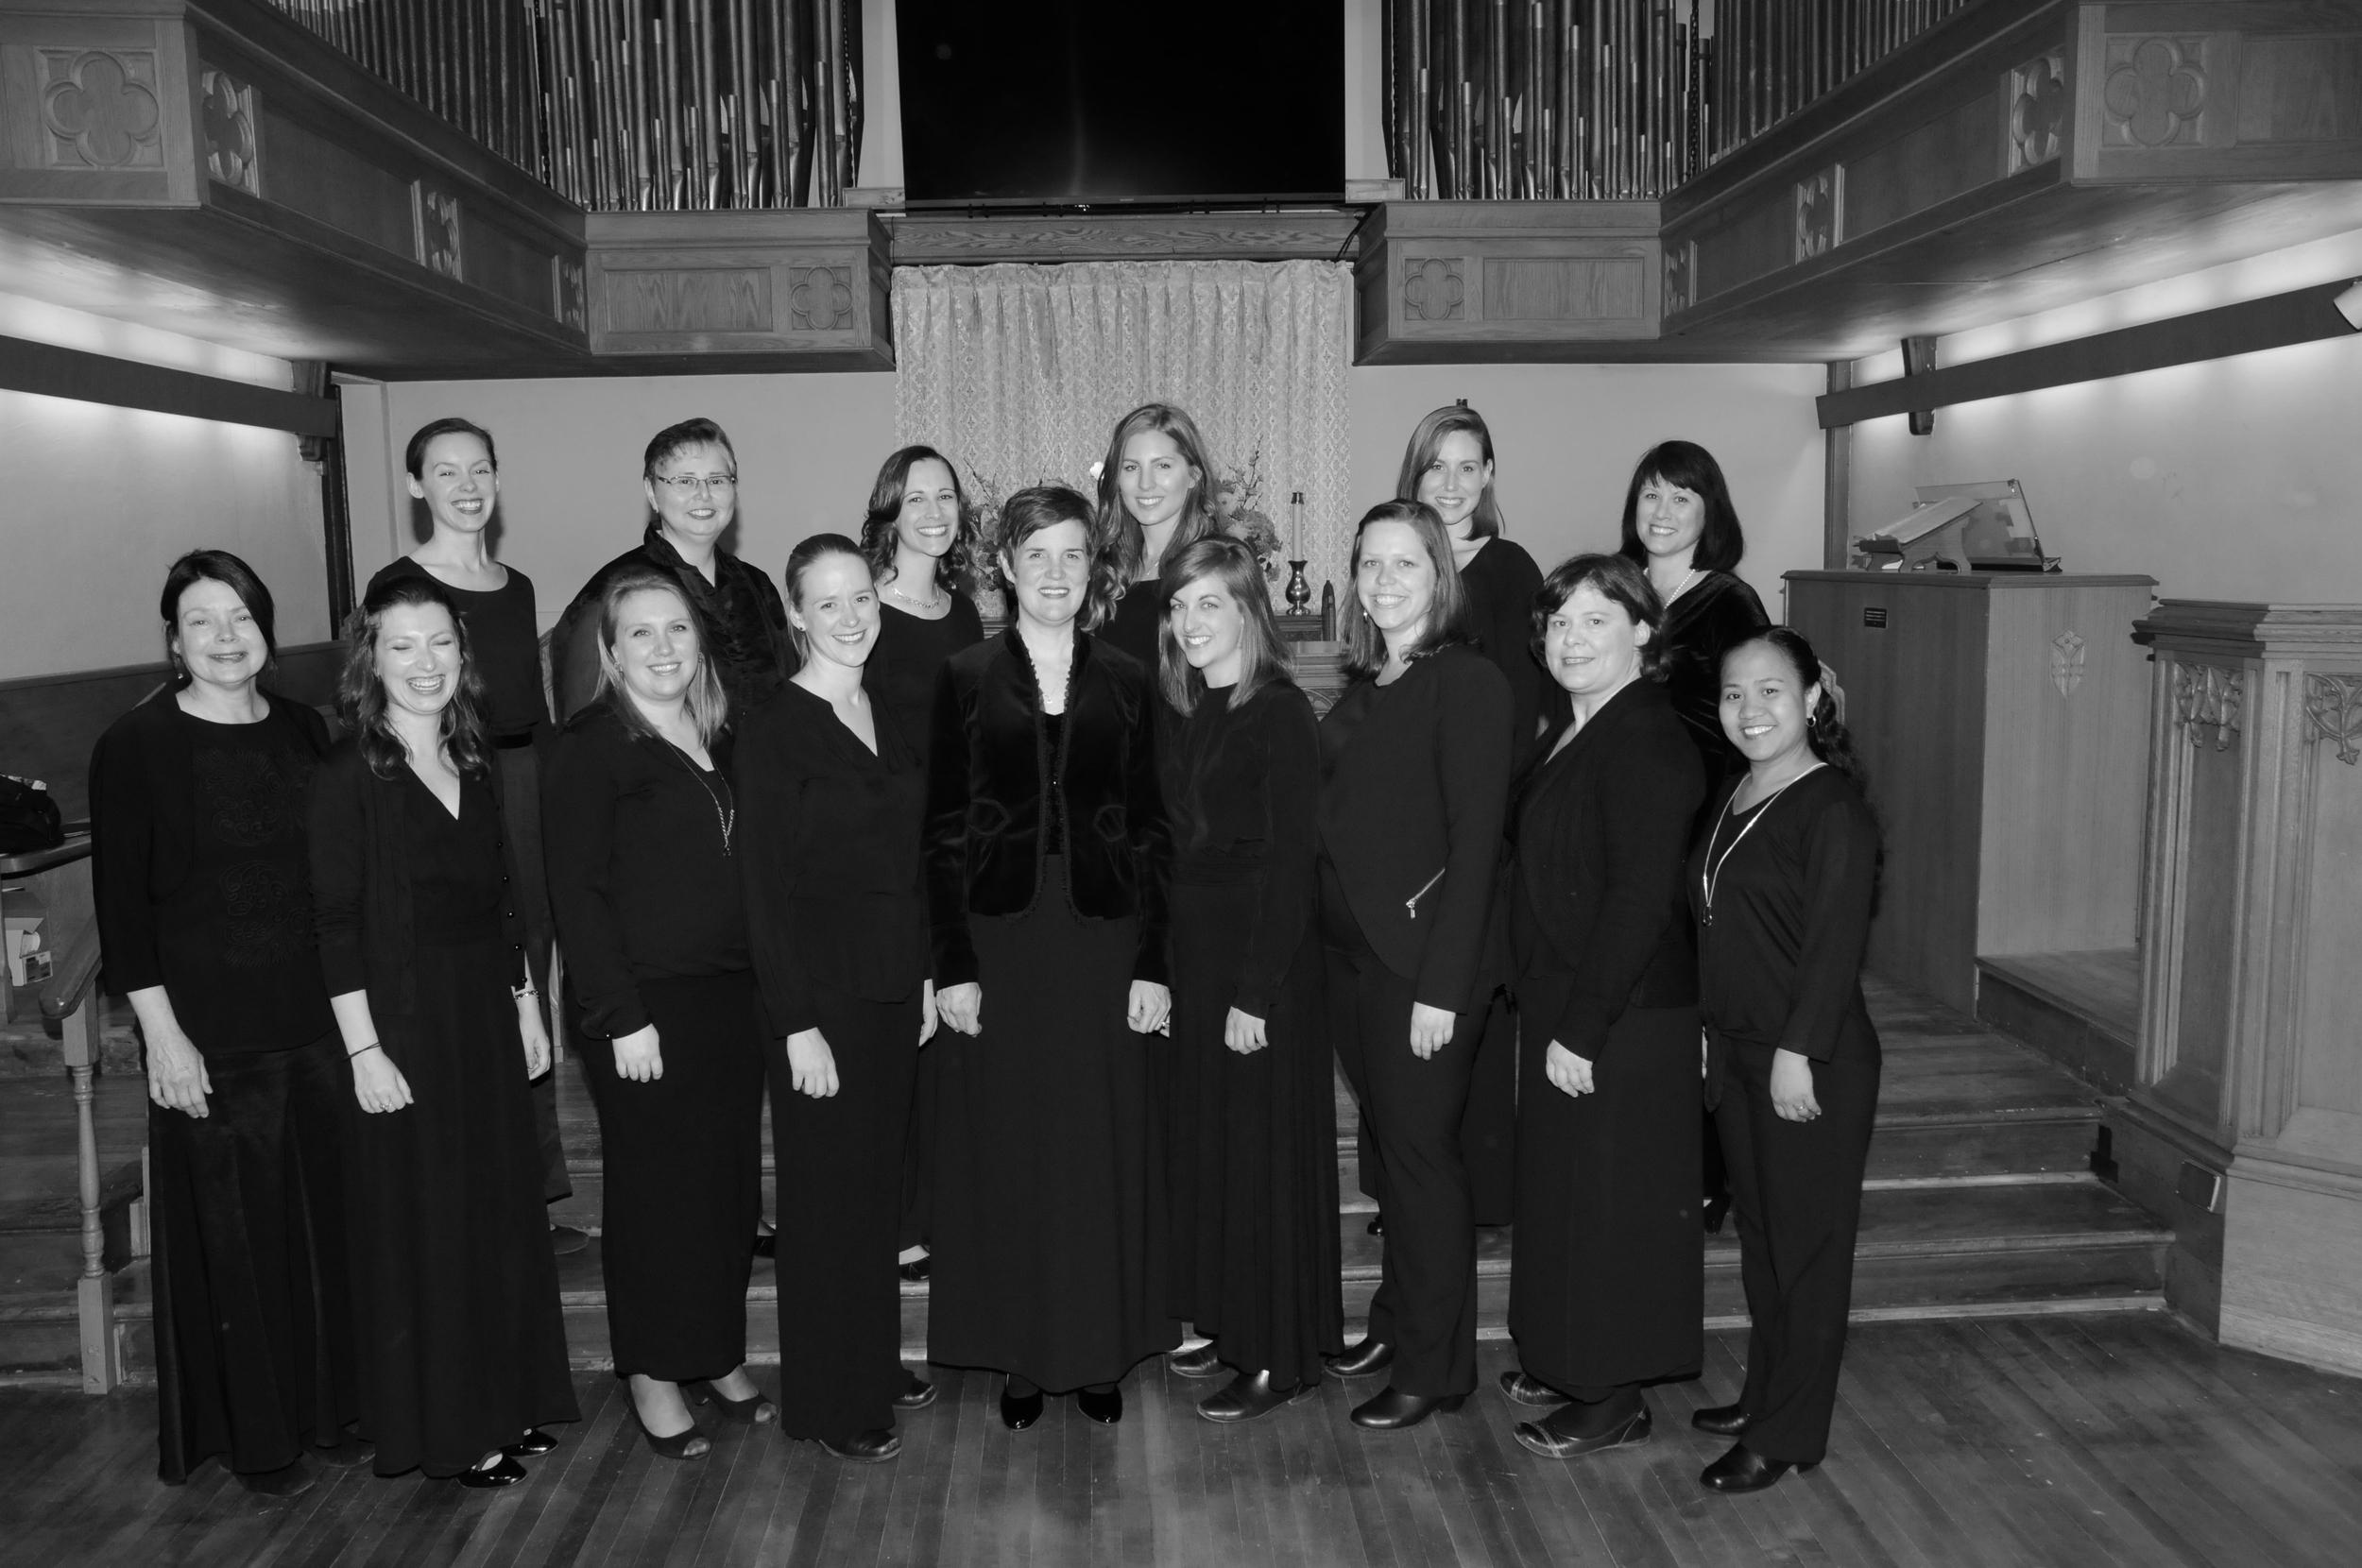 Cantala-womens-choir-talbot-santiago-choral-inspiration